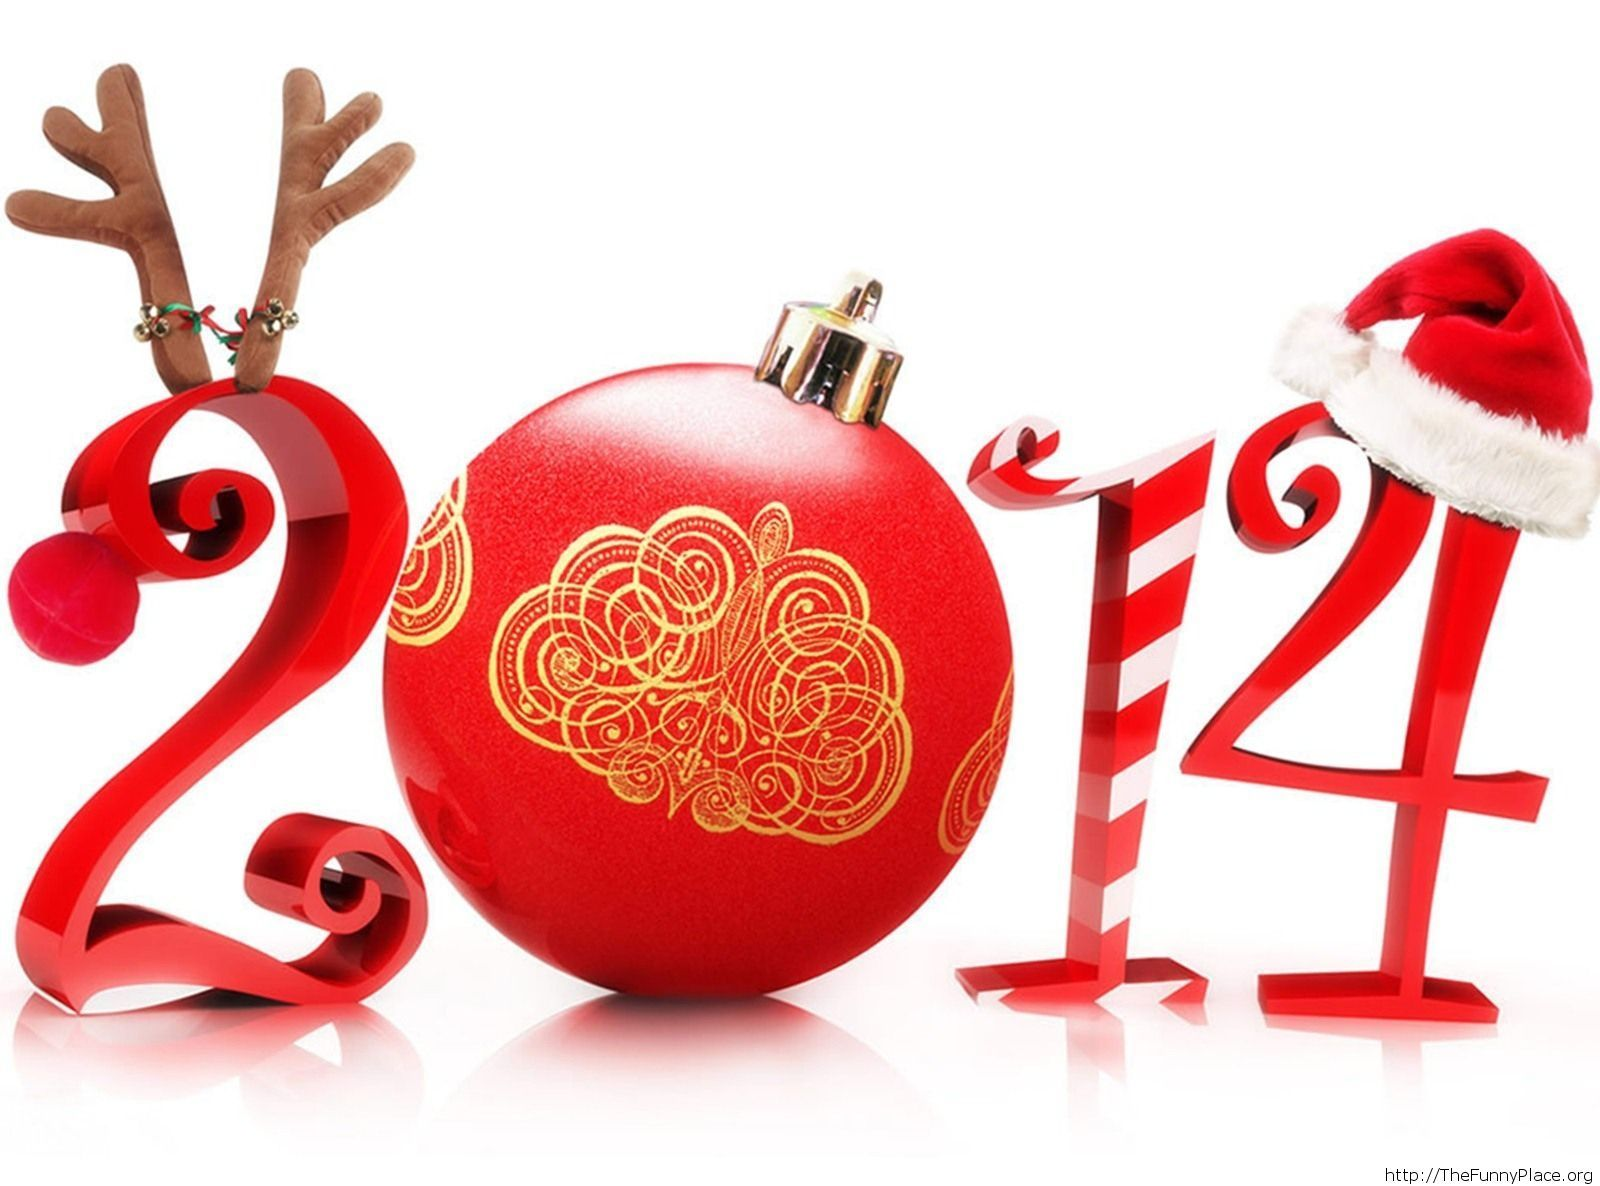 Merry Christmas 2014 HD wallpaper